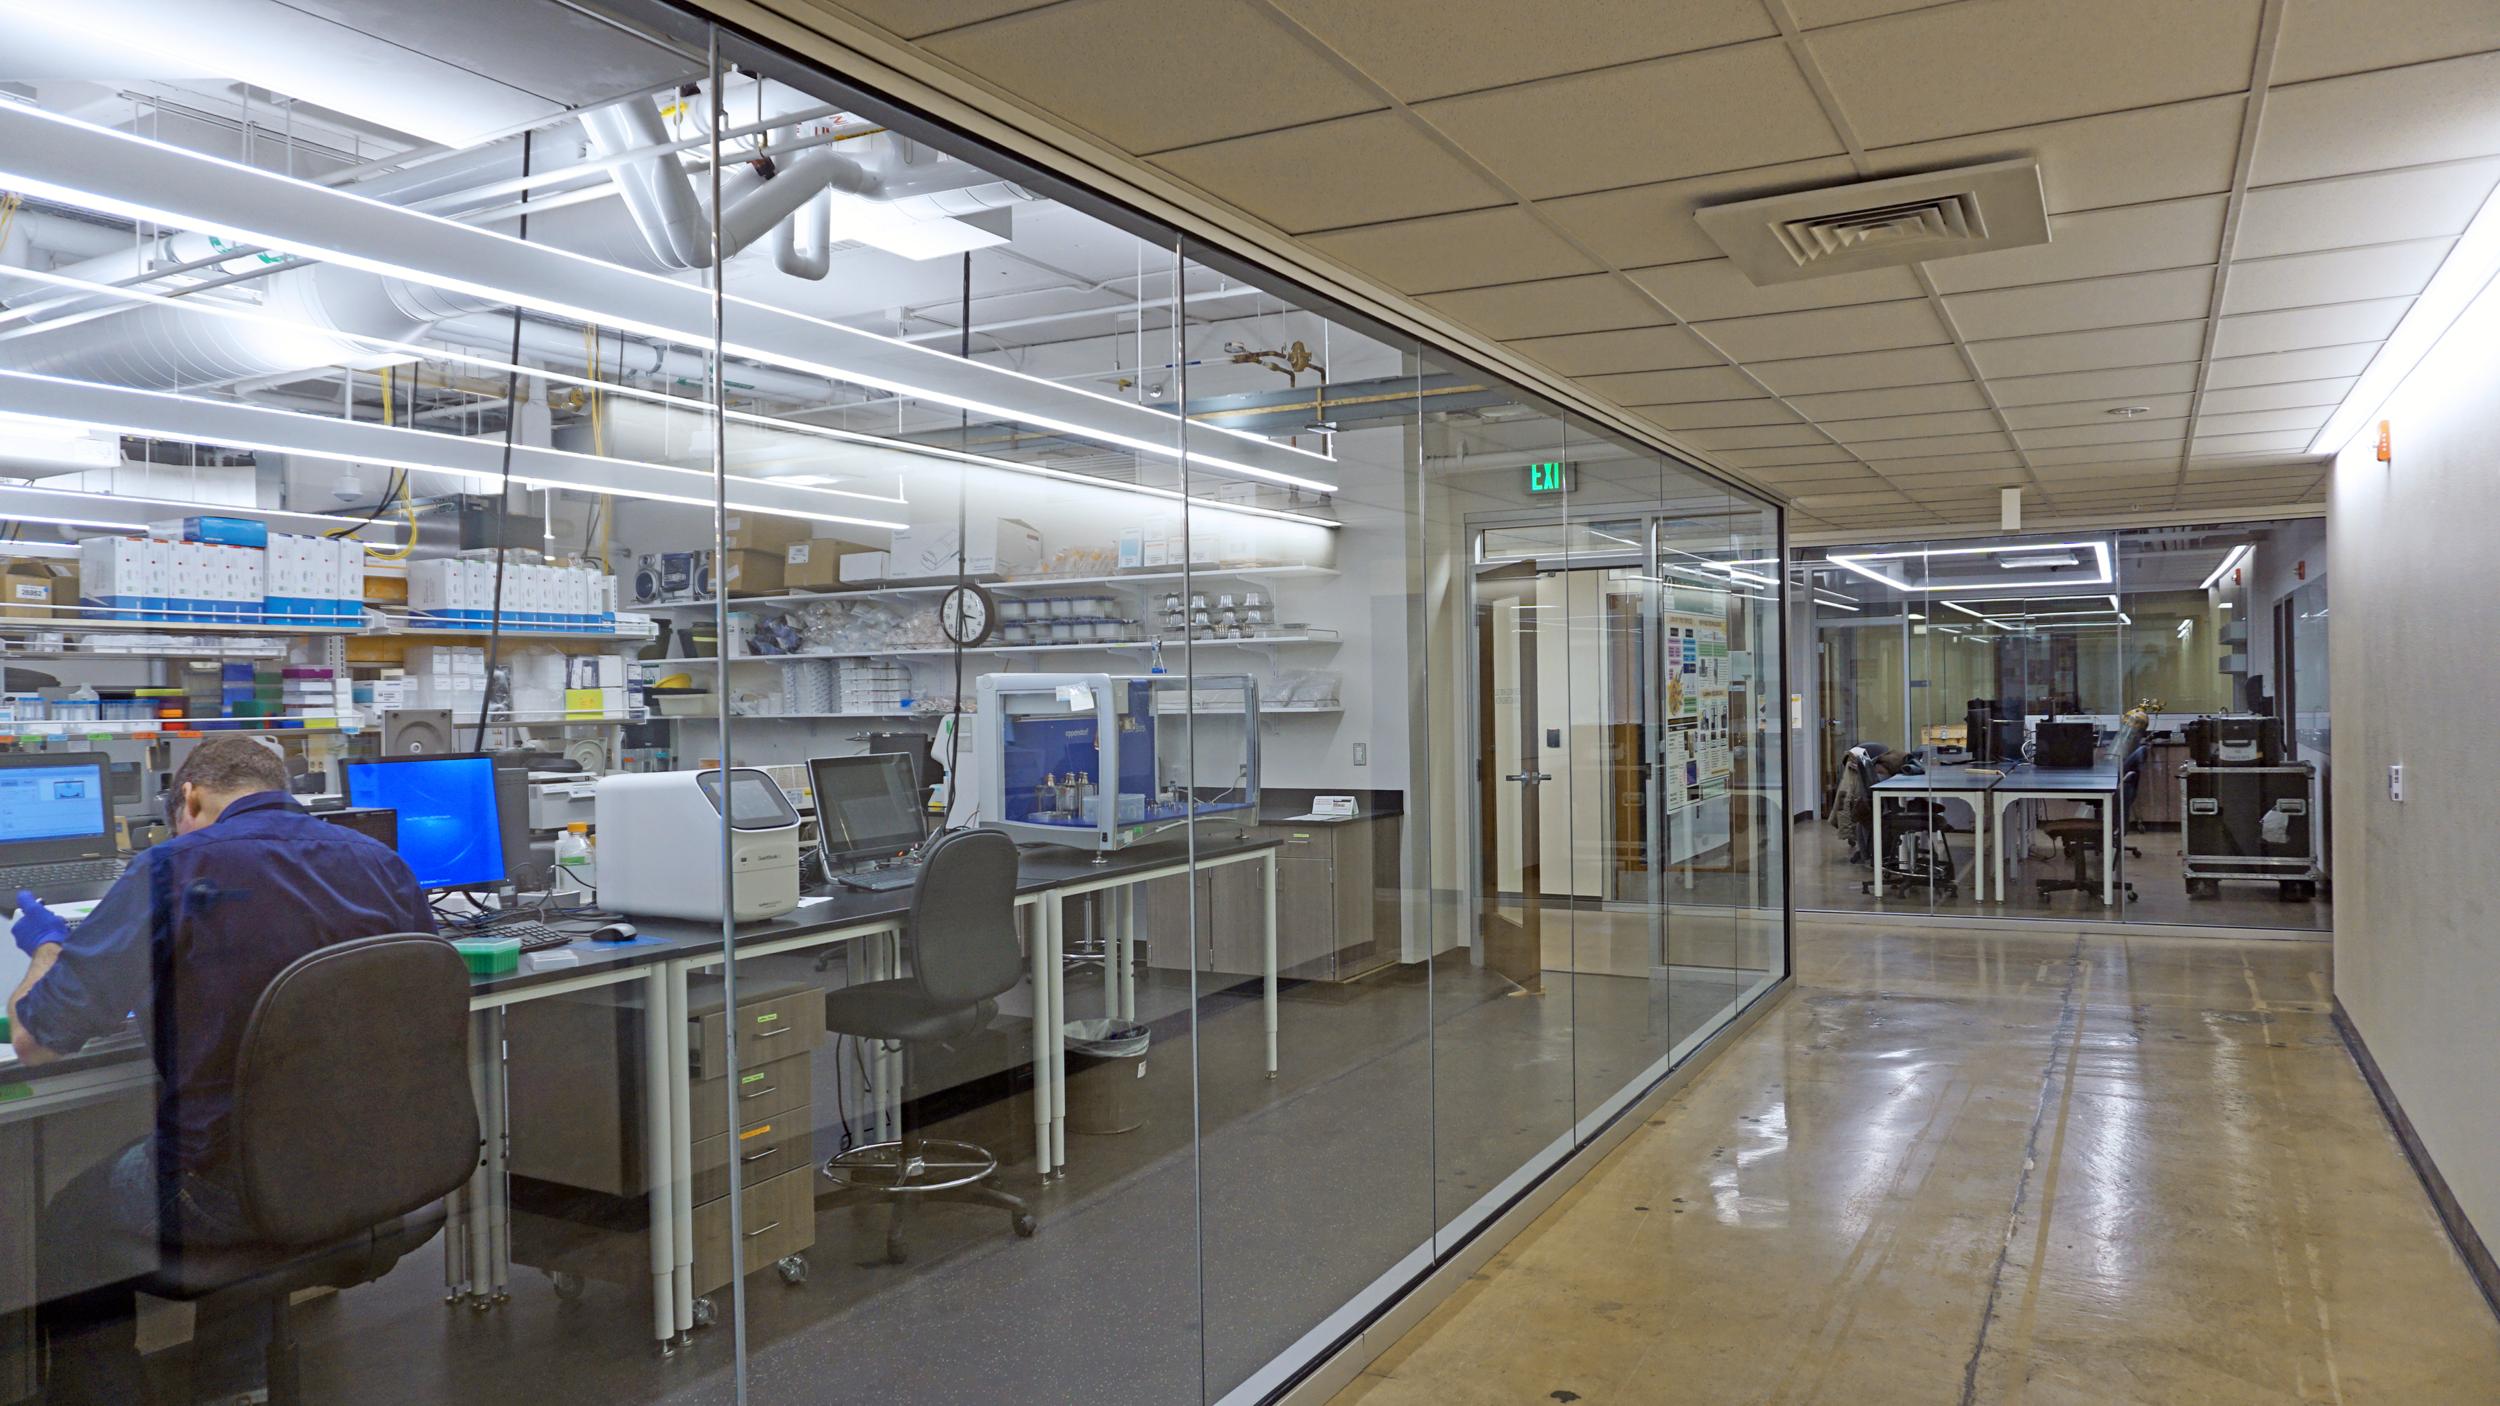 University of Oregon Klamath Lab Core Improvements